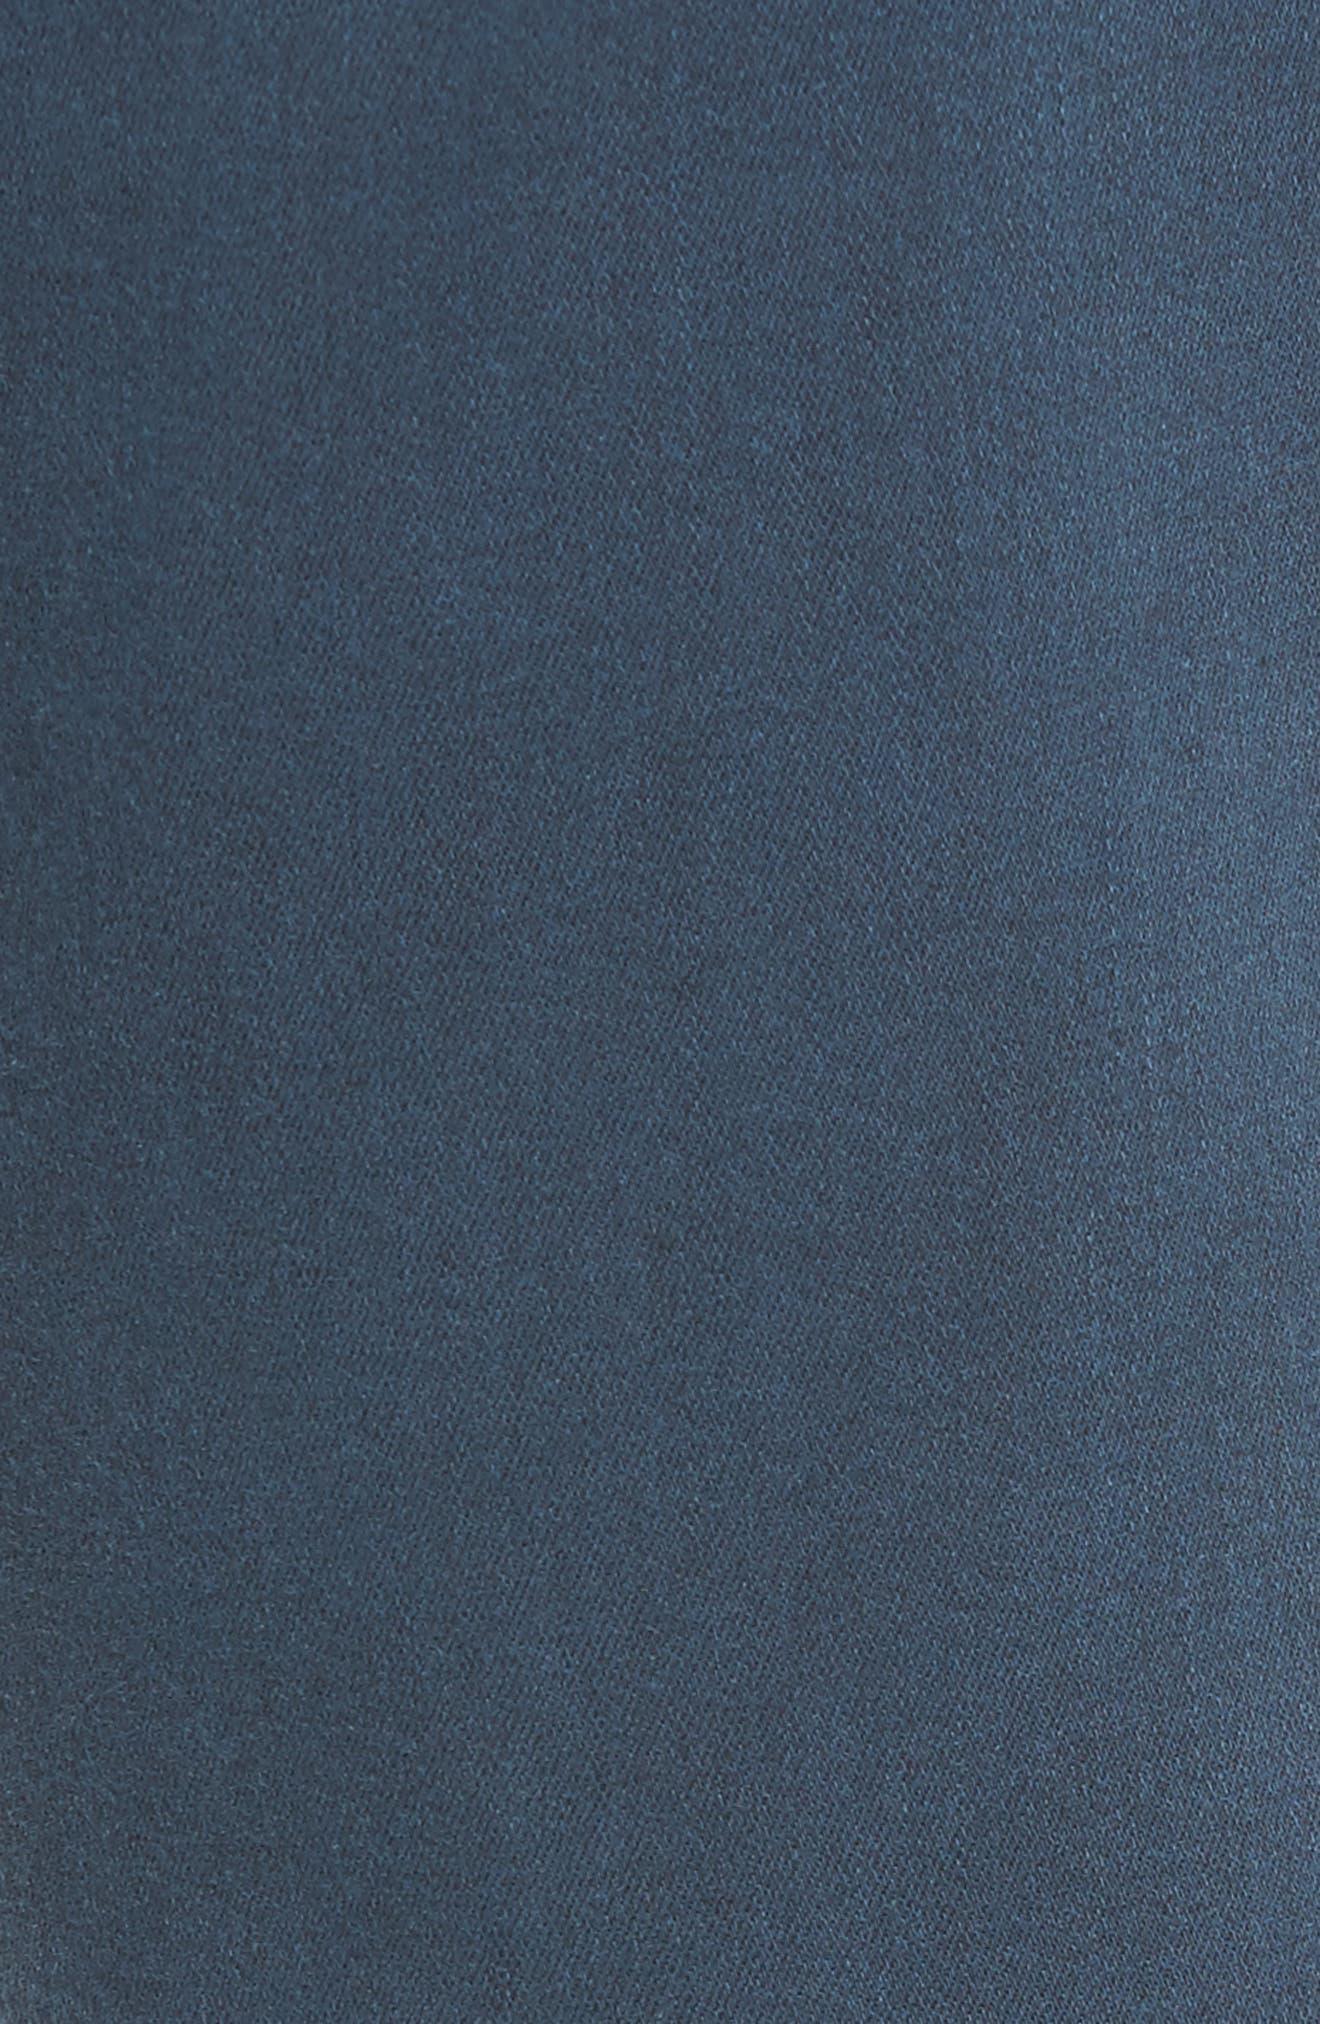 Transcend - Federal Slim Straight Fit Jeans,                             Alternate thumbnail 5, color,                             VINTAGE AMALFI